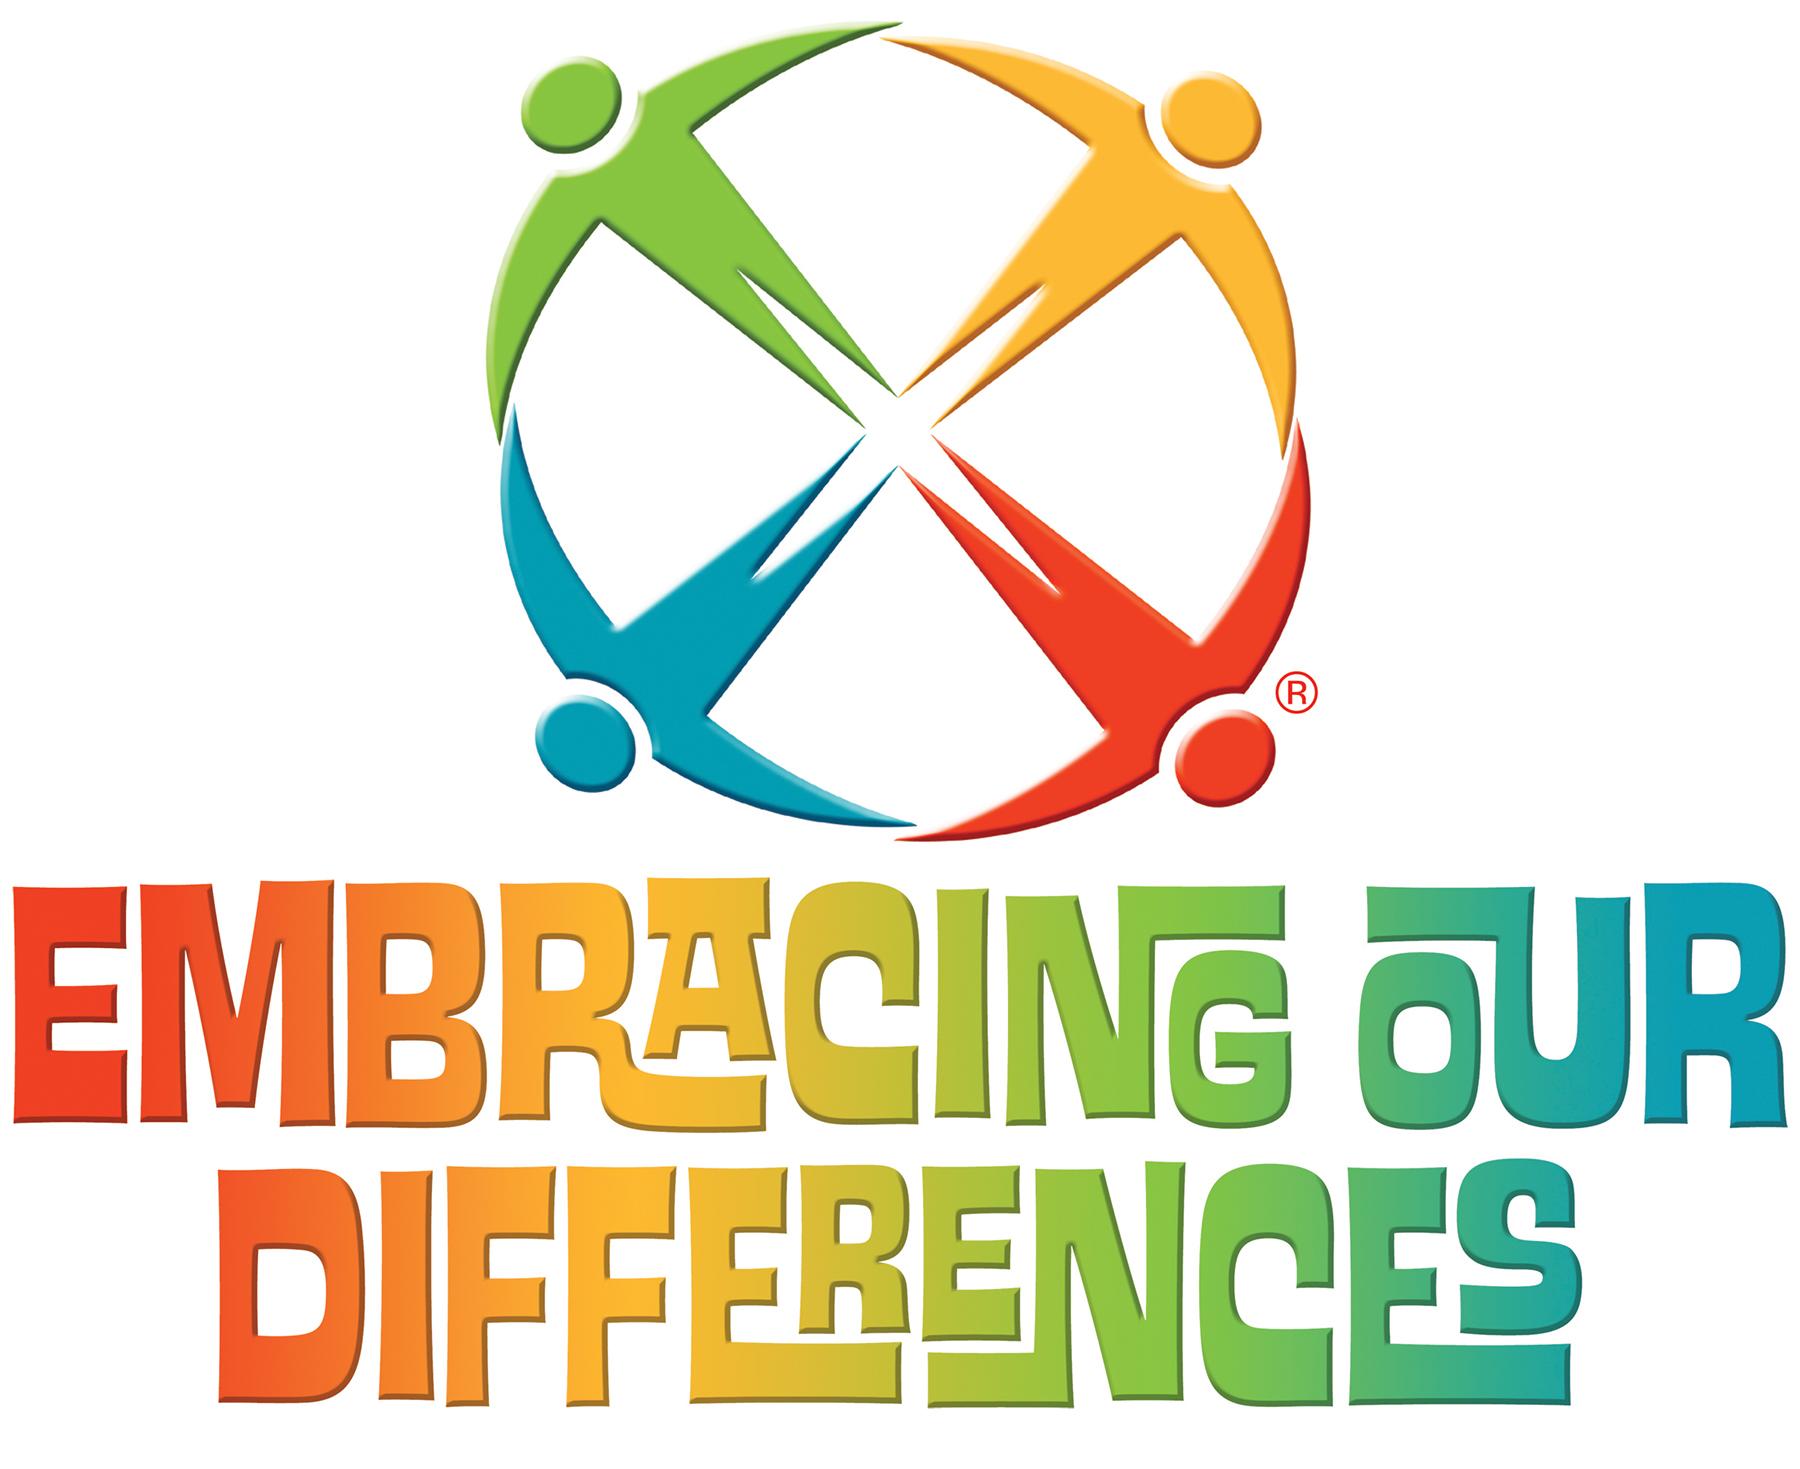 Embracing Our Differences International Art Exhibit Celebrating Diversity 2019 - logo